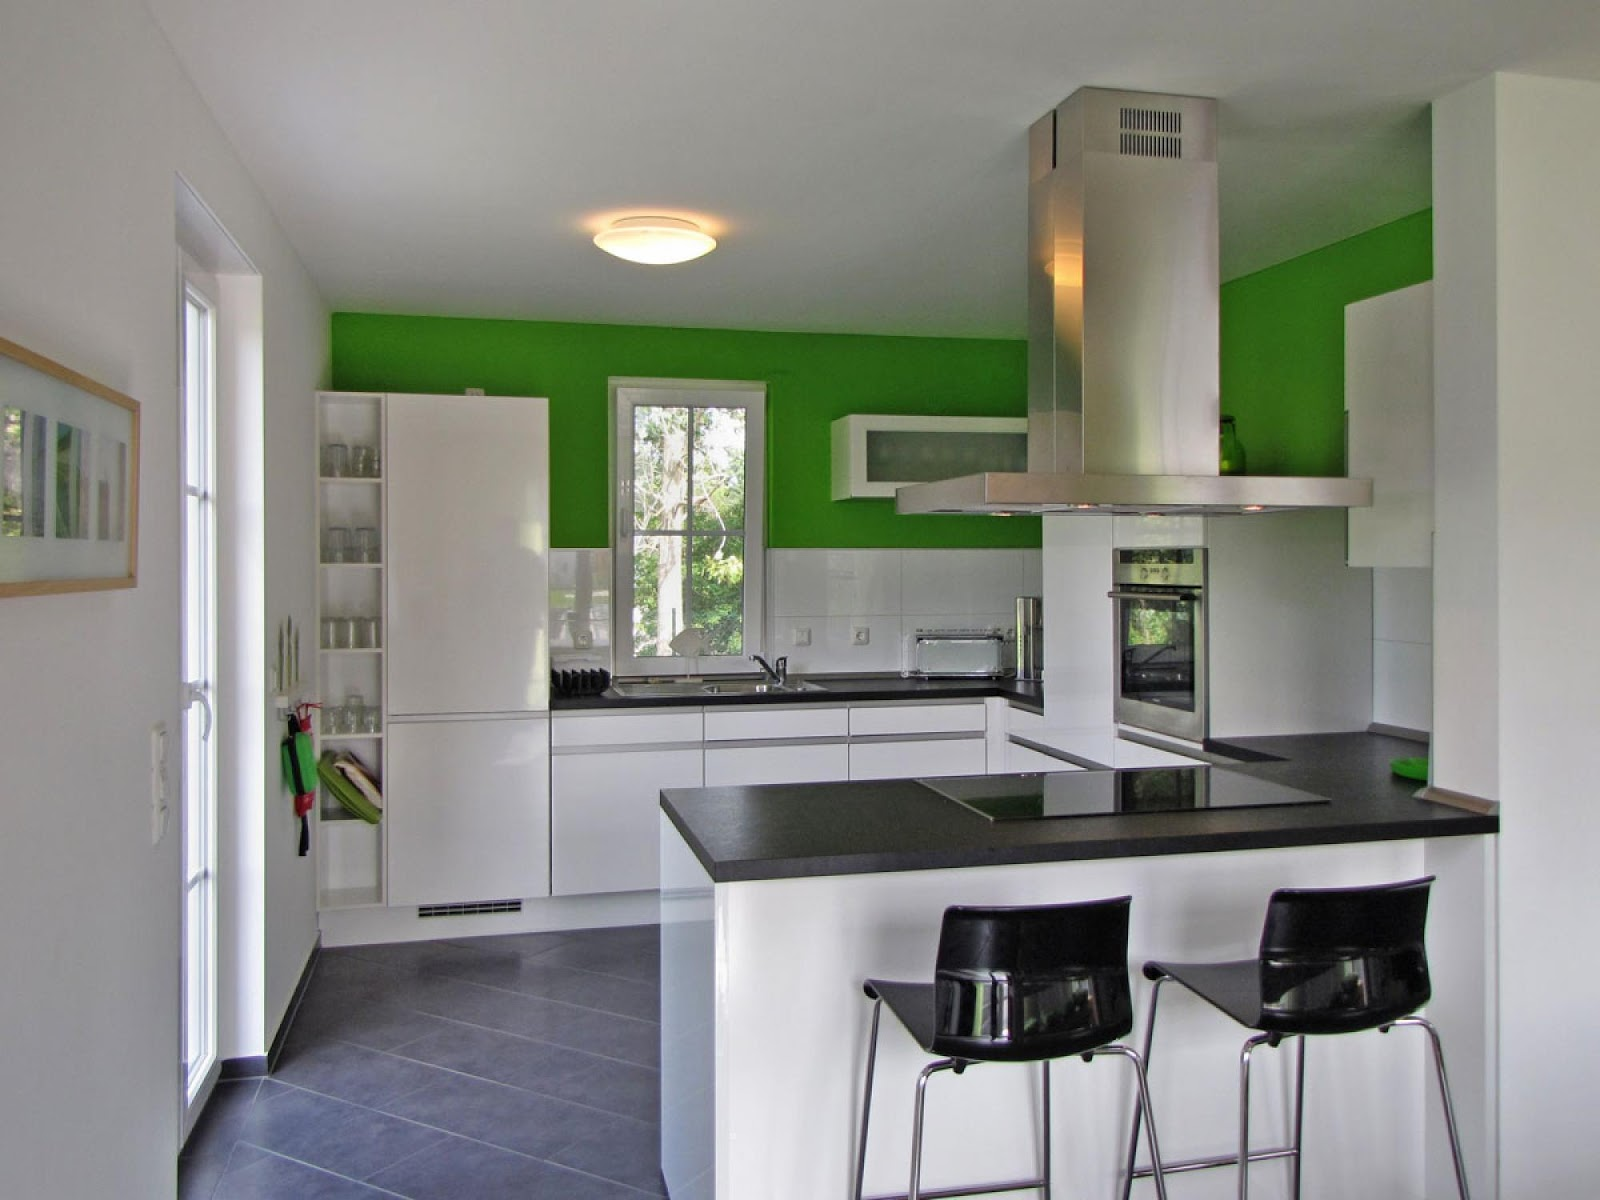 Desain Dapur Terbuka Minimalis Sobhome